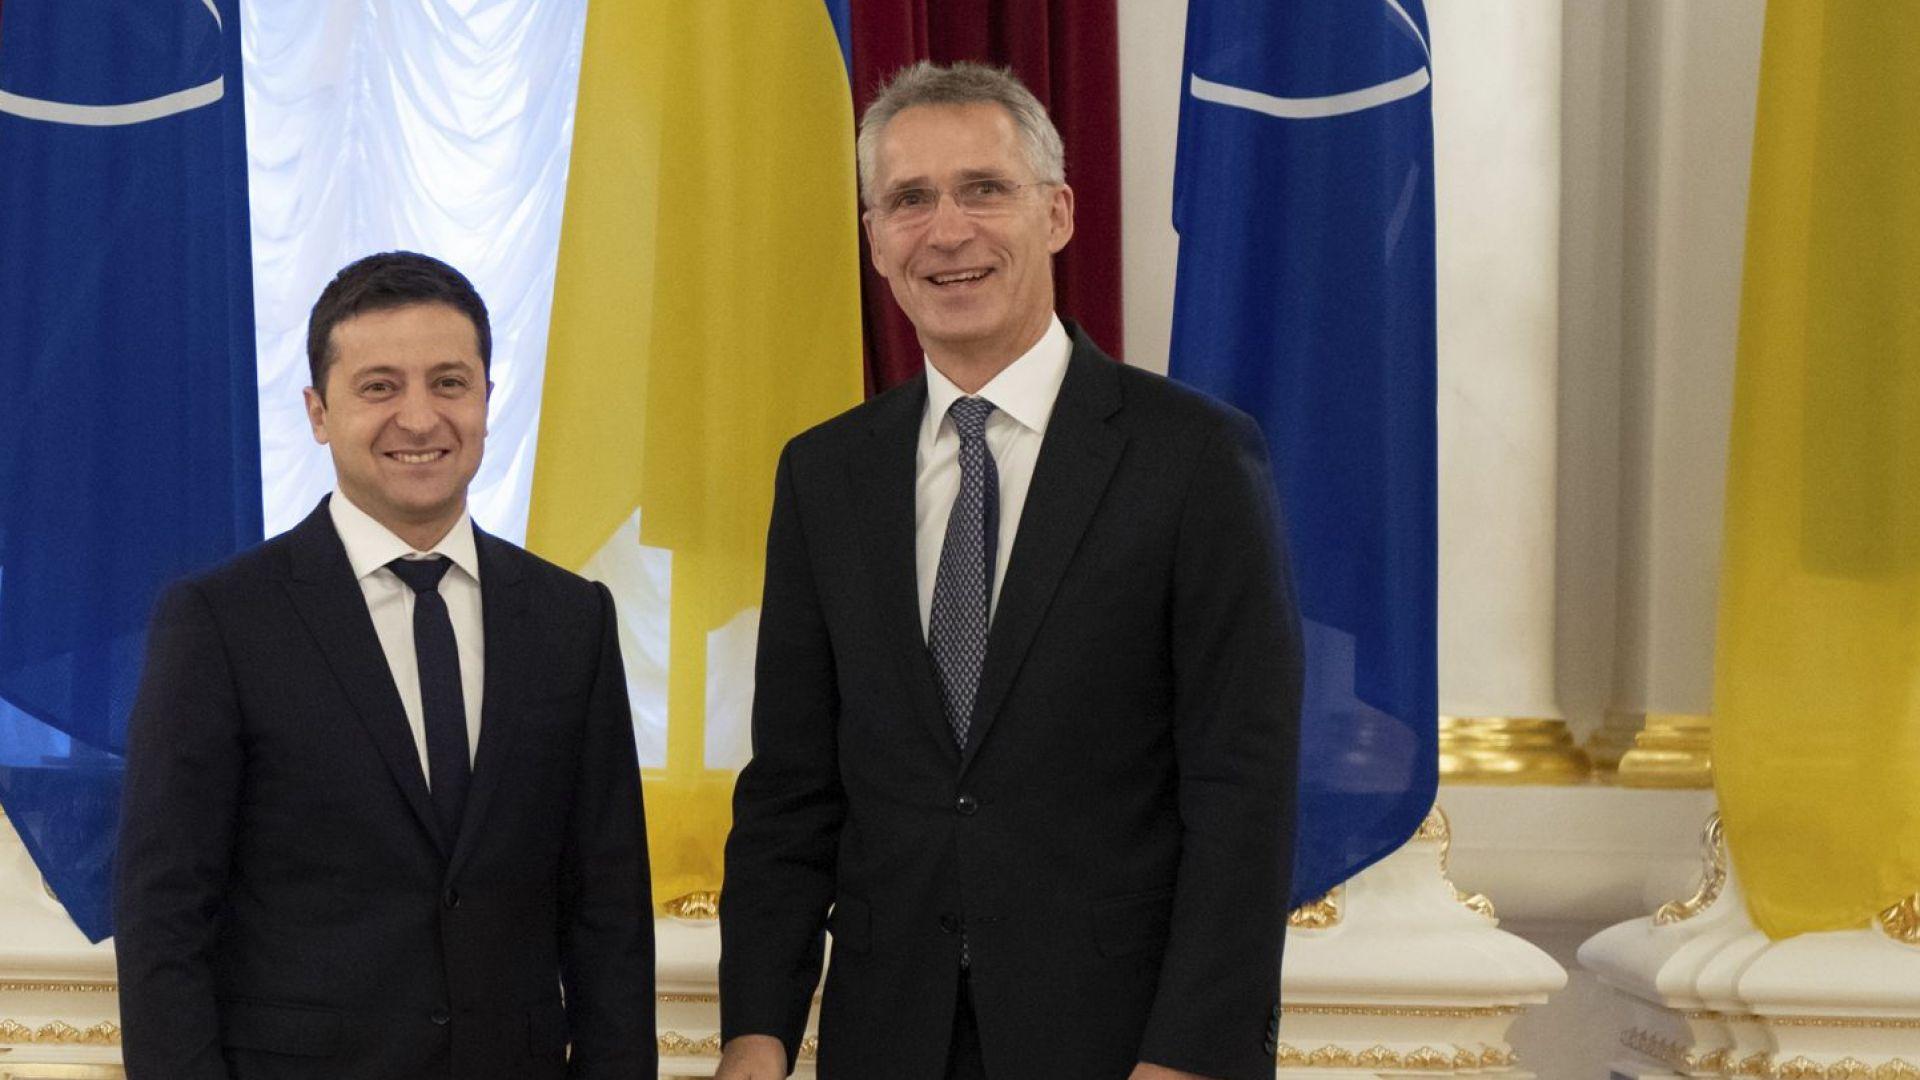 НАТО и Украйна омилостивиха Орбан за унгарското малцинство